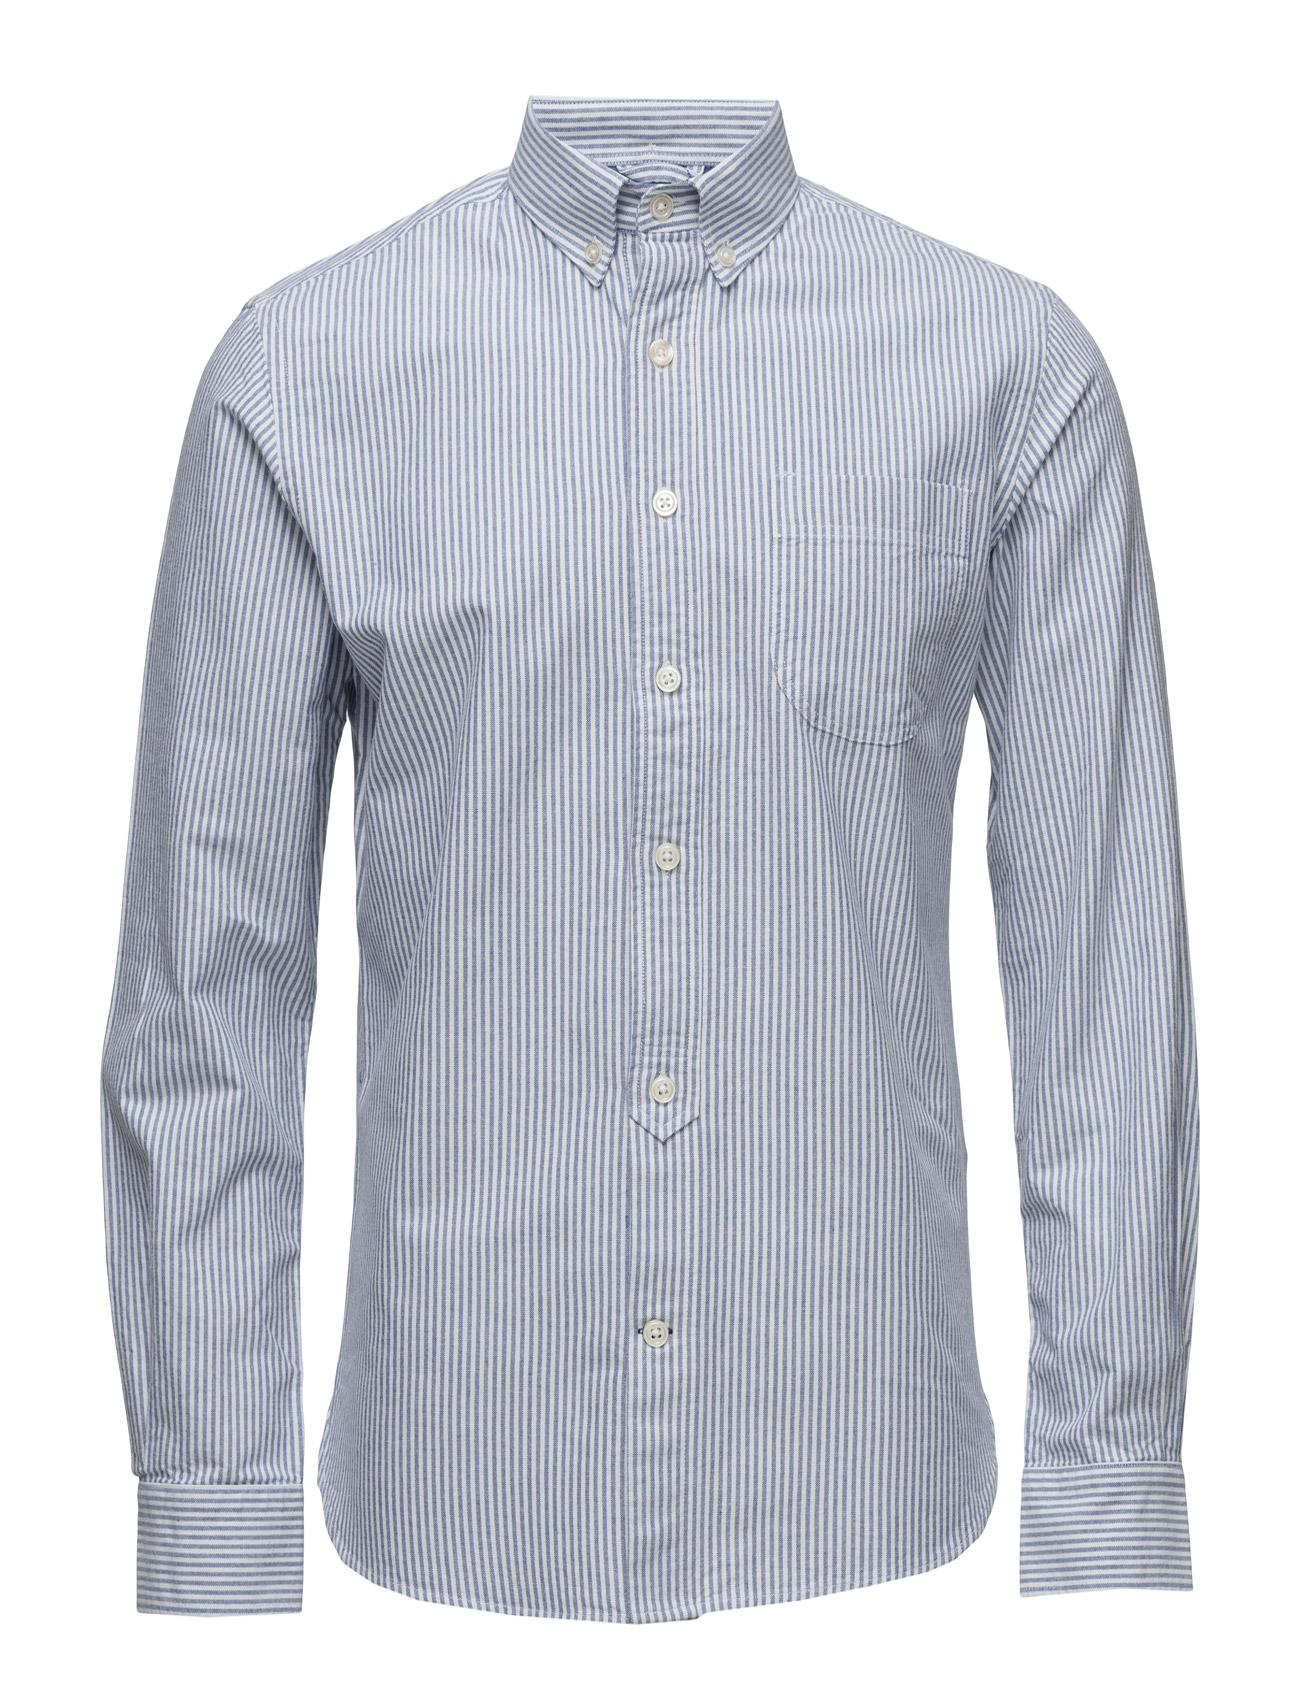 Billede af Button Down Oxford Shirt Striped -